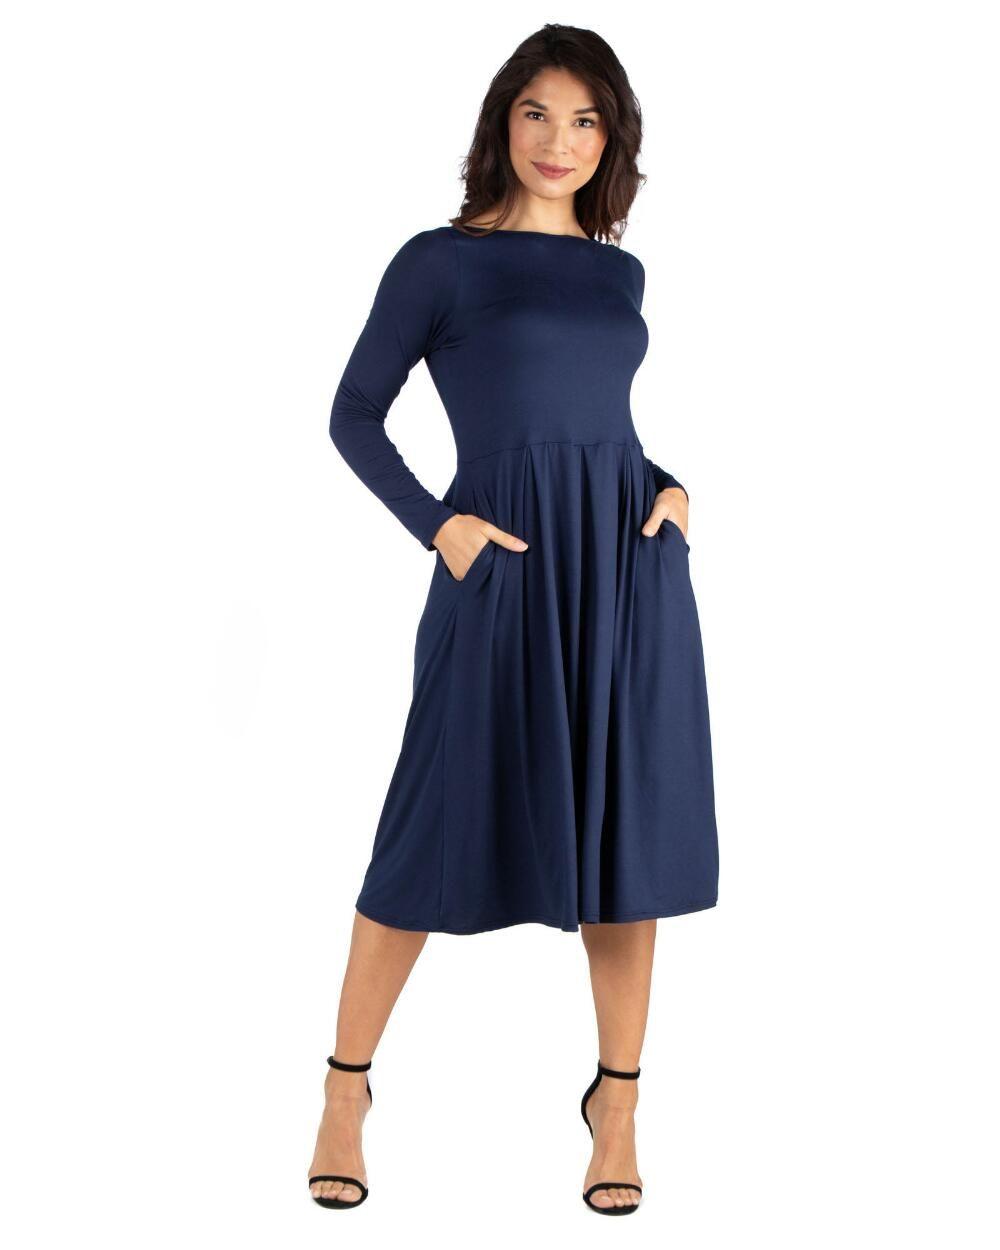 Fit and flare midi dress dresses fit flare flare dress